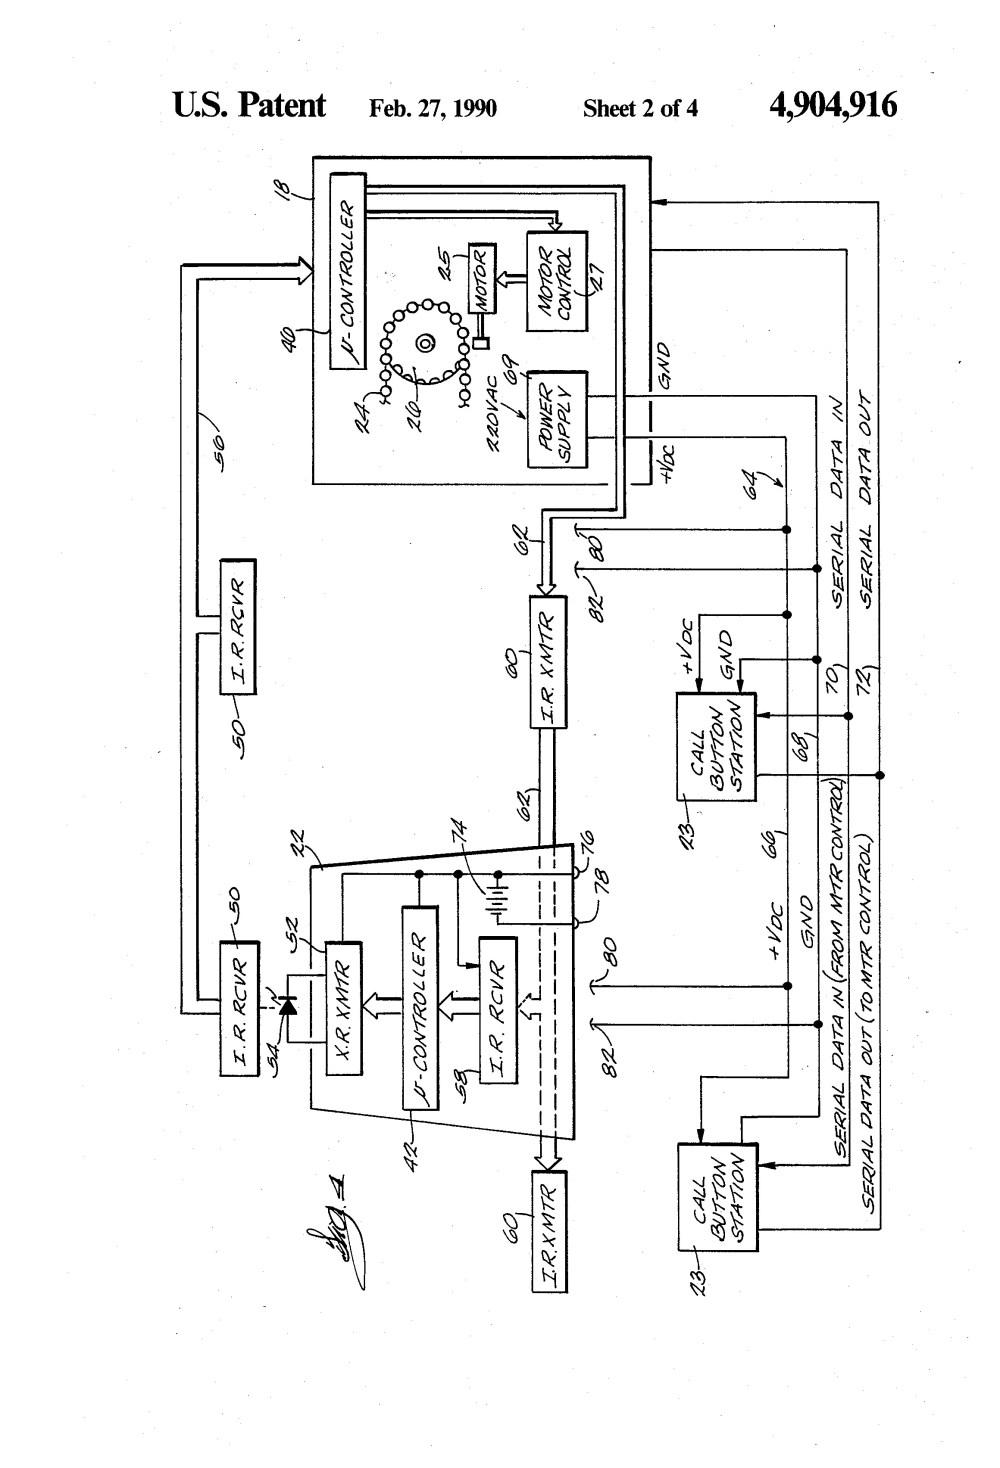 medium resolution of arm lift wiring diagram trusted wiring diagram 1989 gmc sierra radio wiring diagrams arm lift wiring diagram